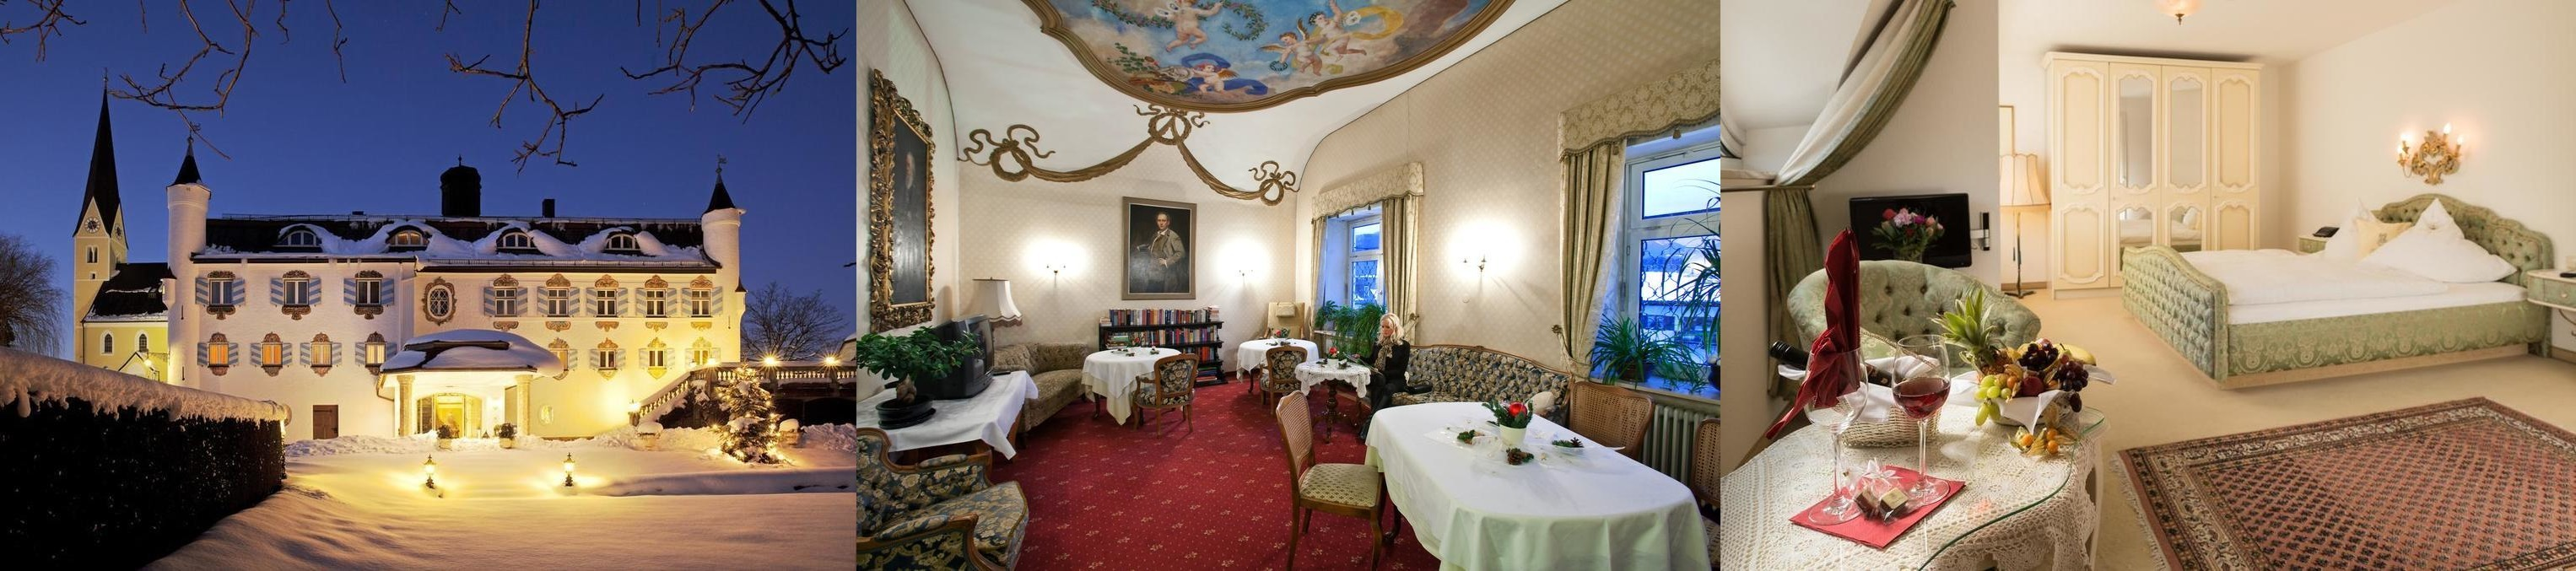 Hotel Bonnschloessl